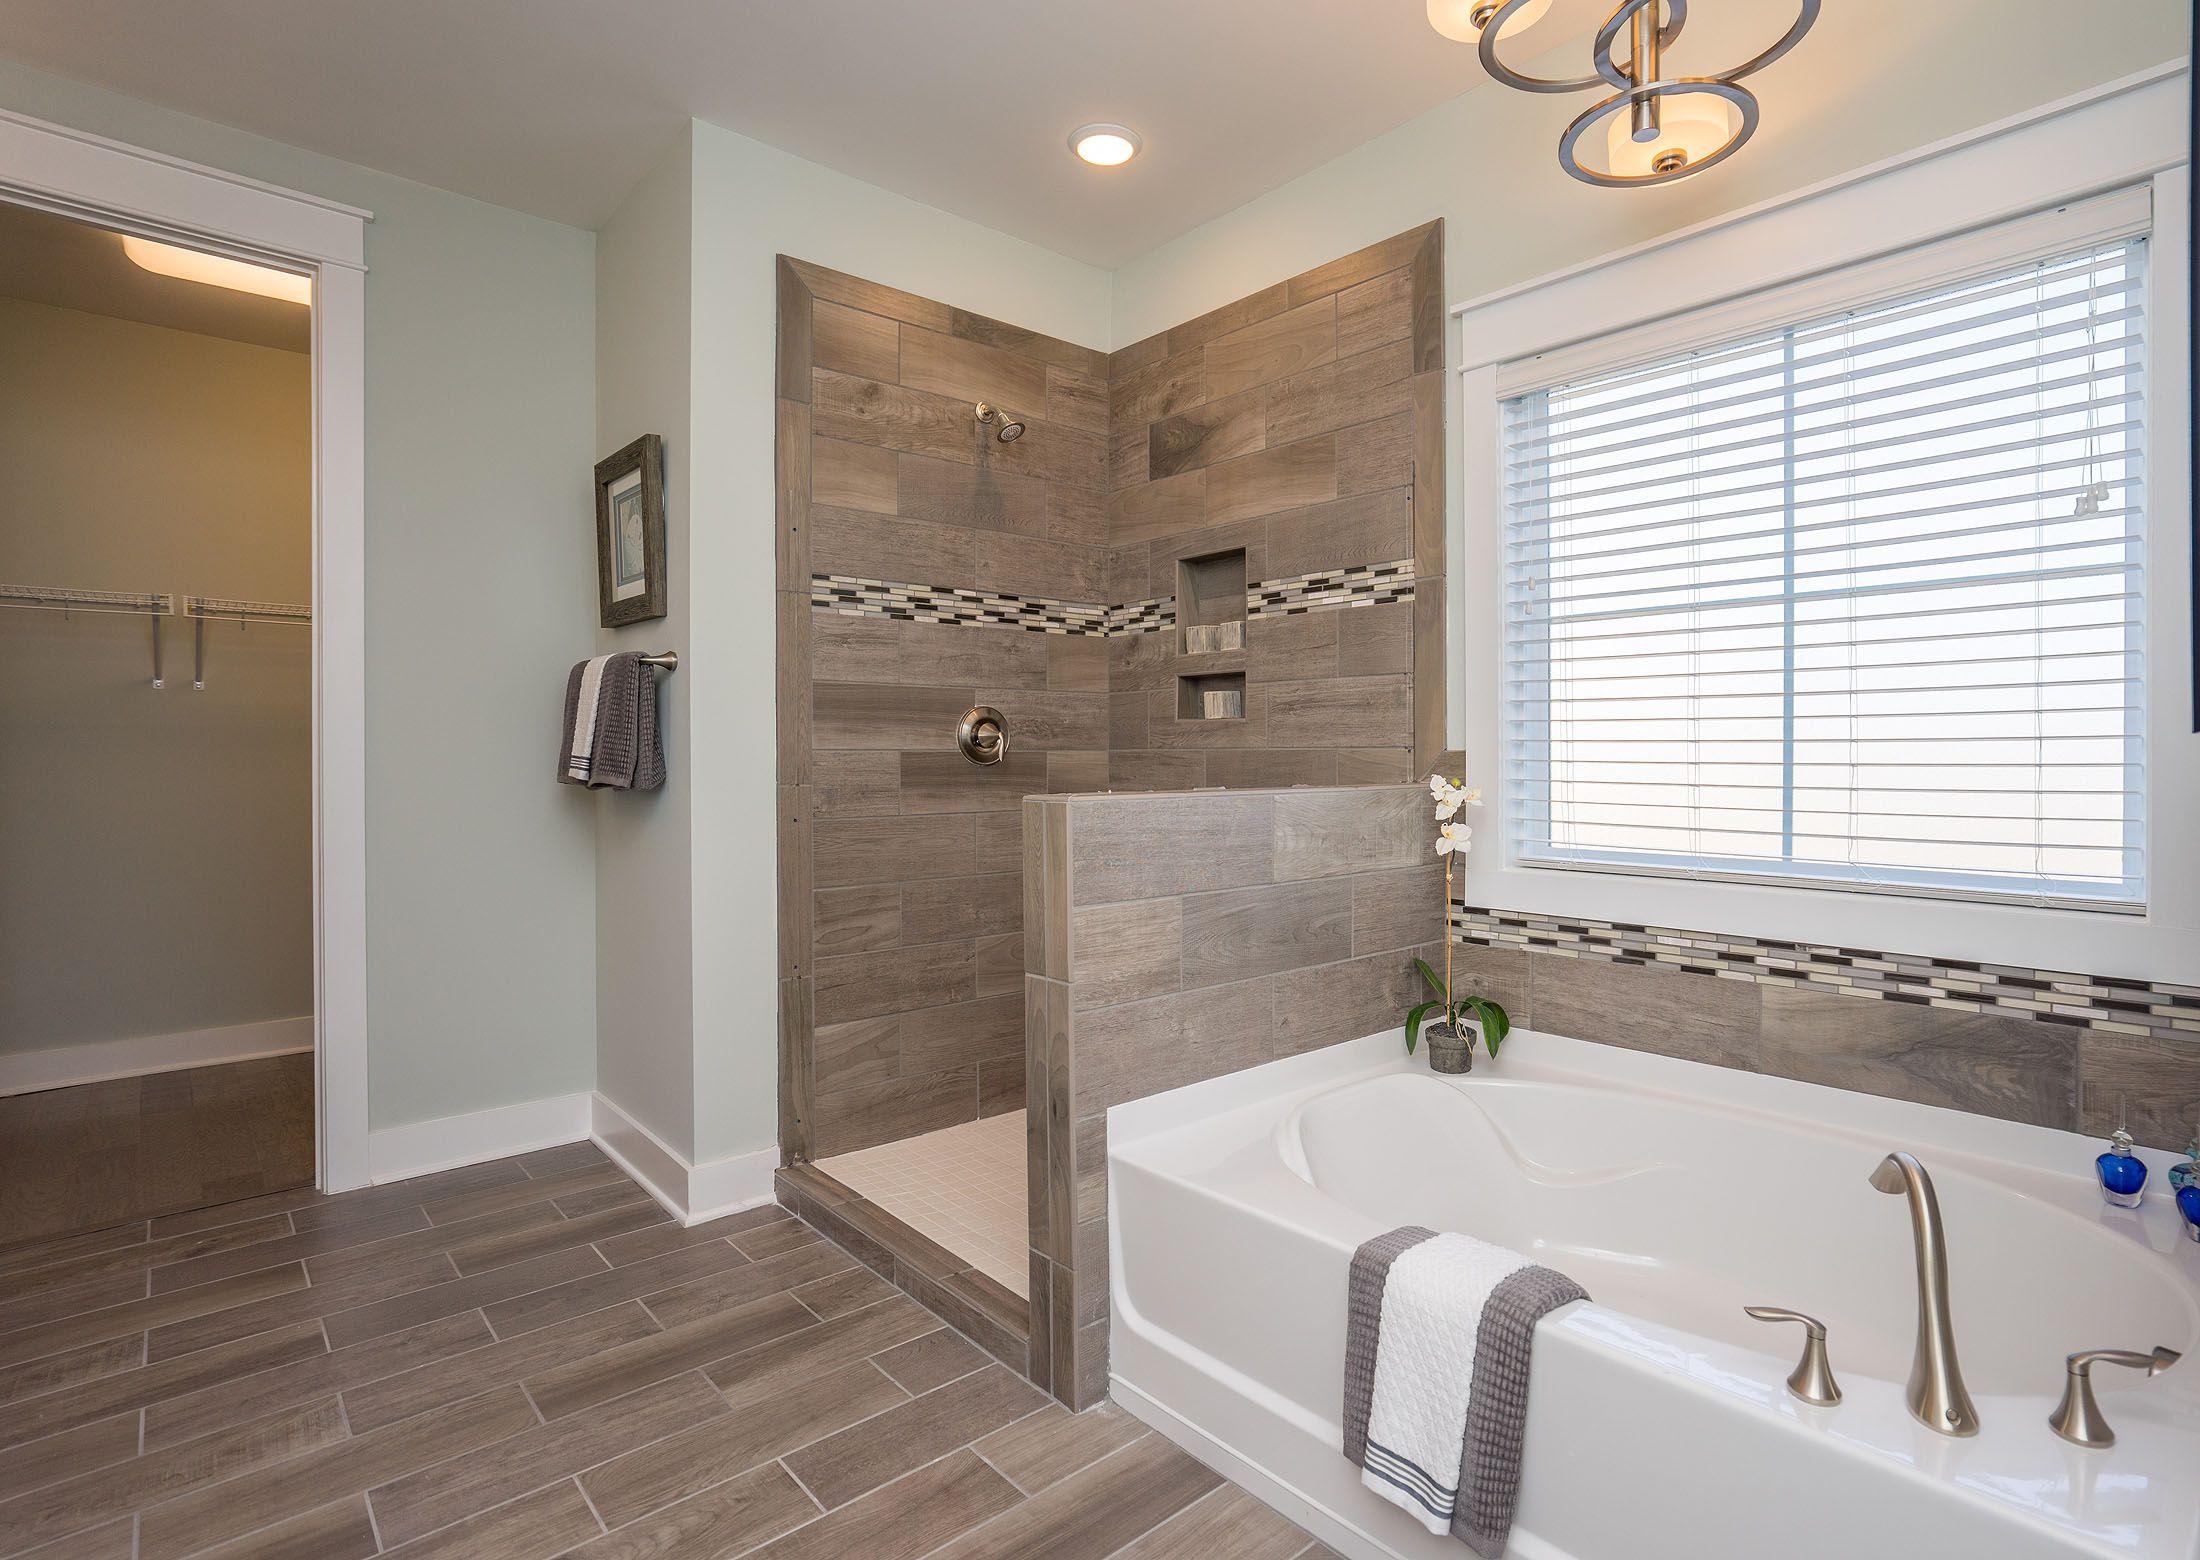 Bathroom featured in The Pinehurst By Village Park Homes in Savannah, GA